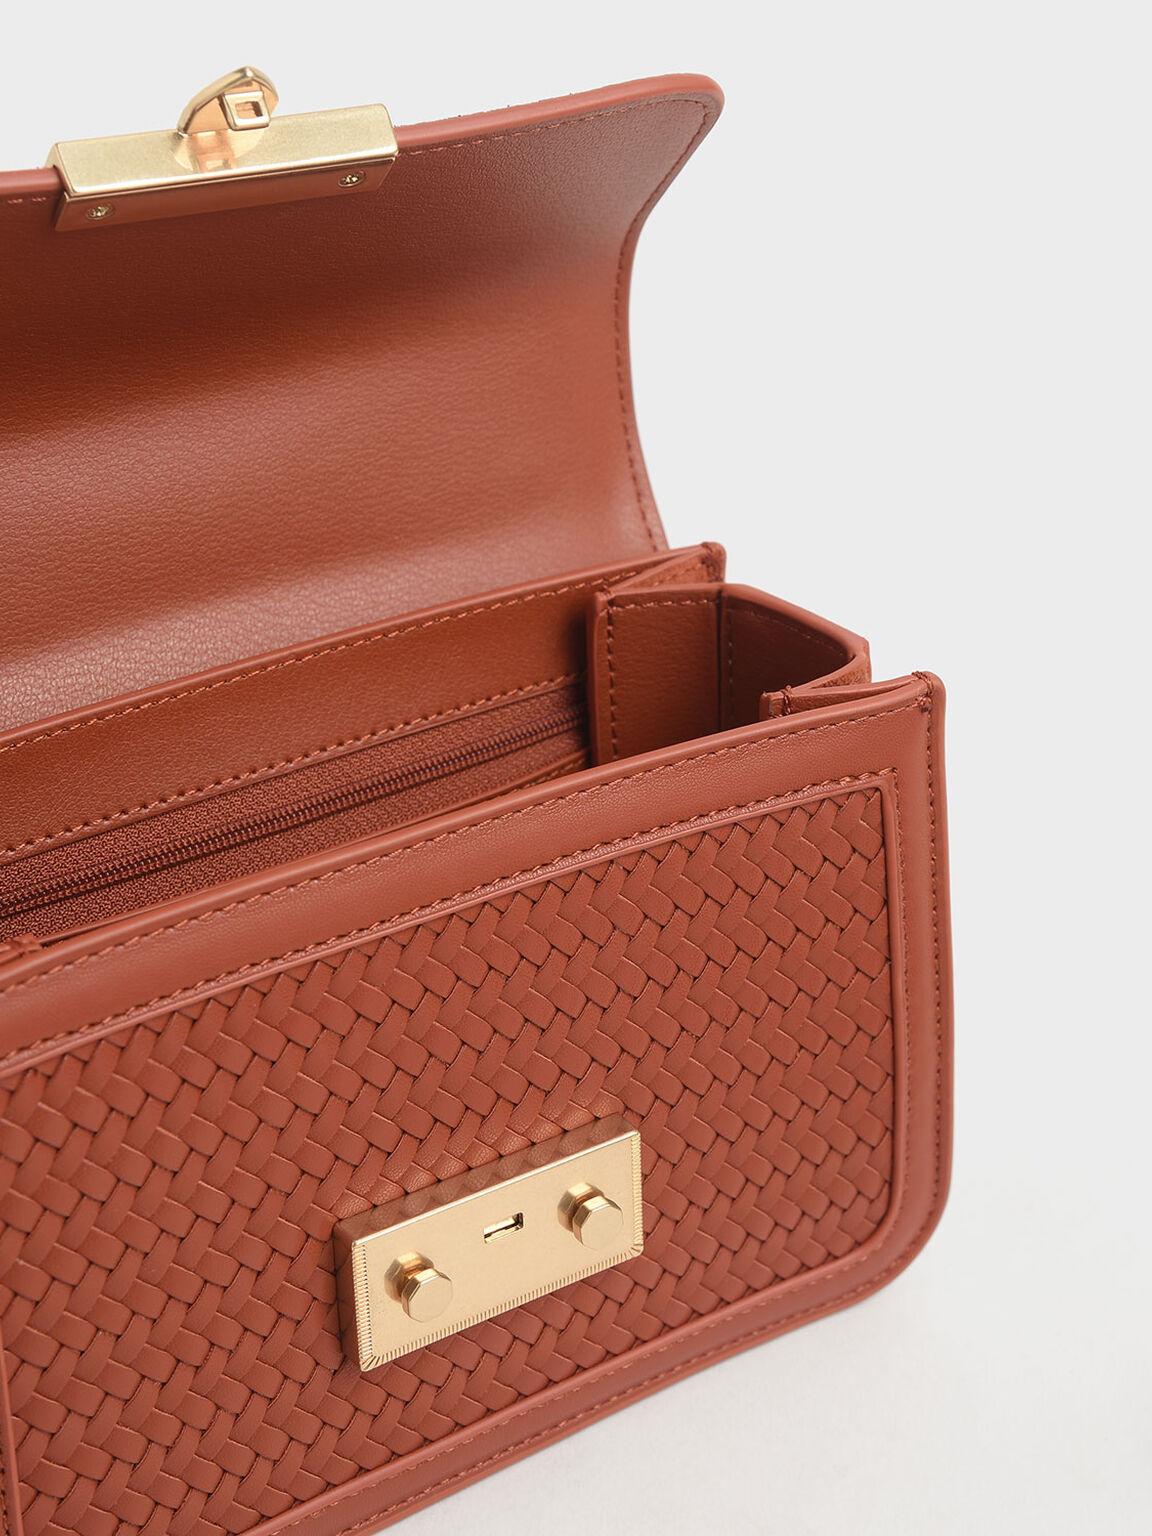 Woven Boxy Chain Strap Bag, Cognac, hi-res